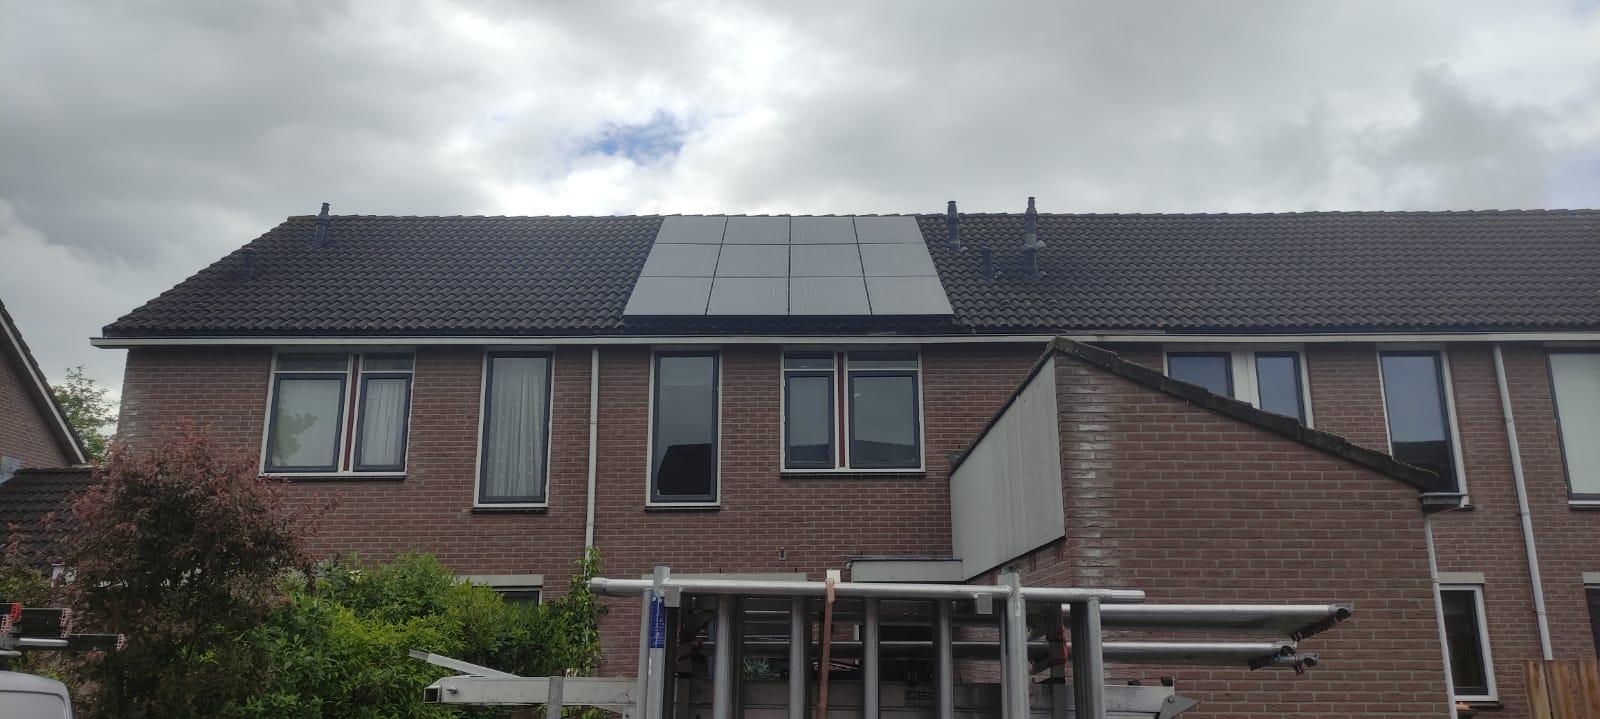 SolarWatt black edition glas/glas zonnepanelen Ommen Overijssel